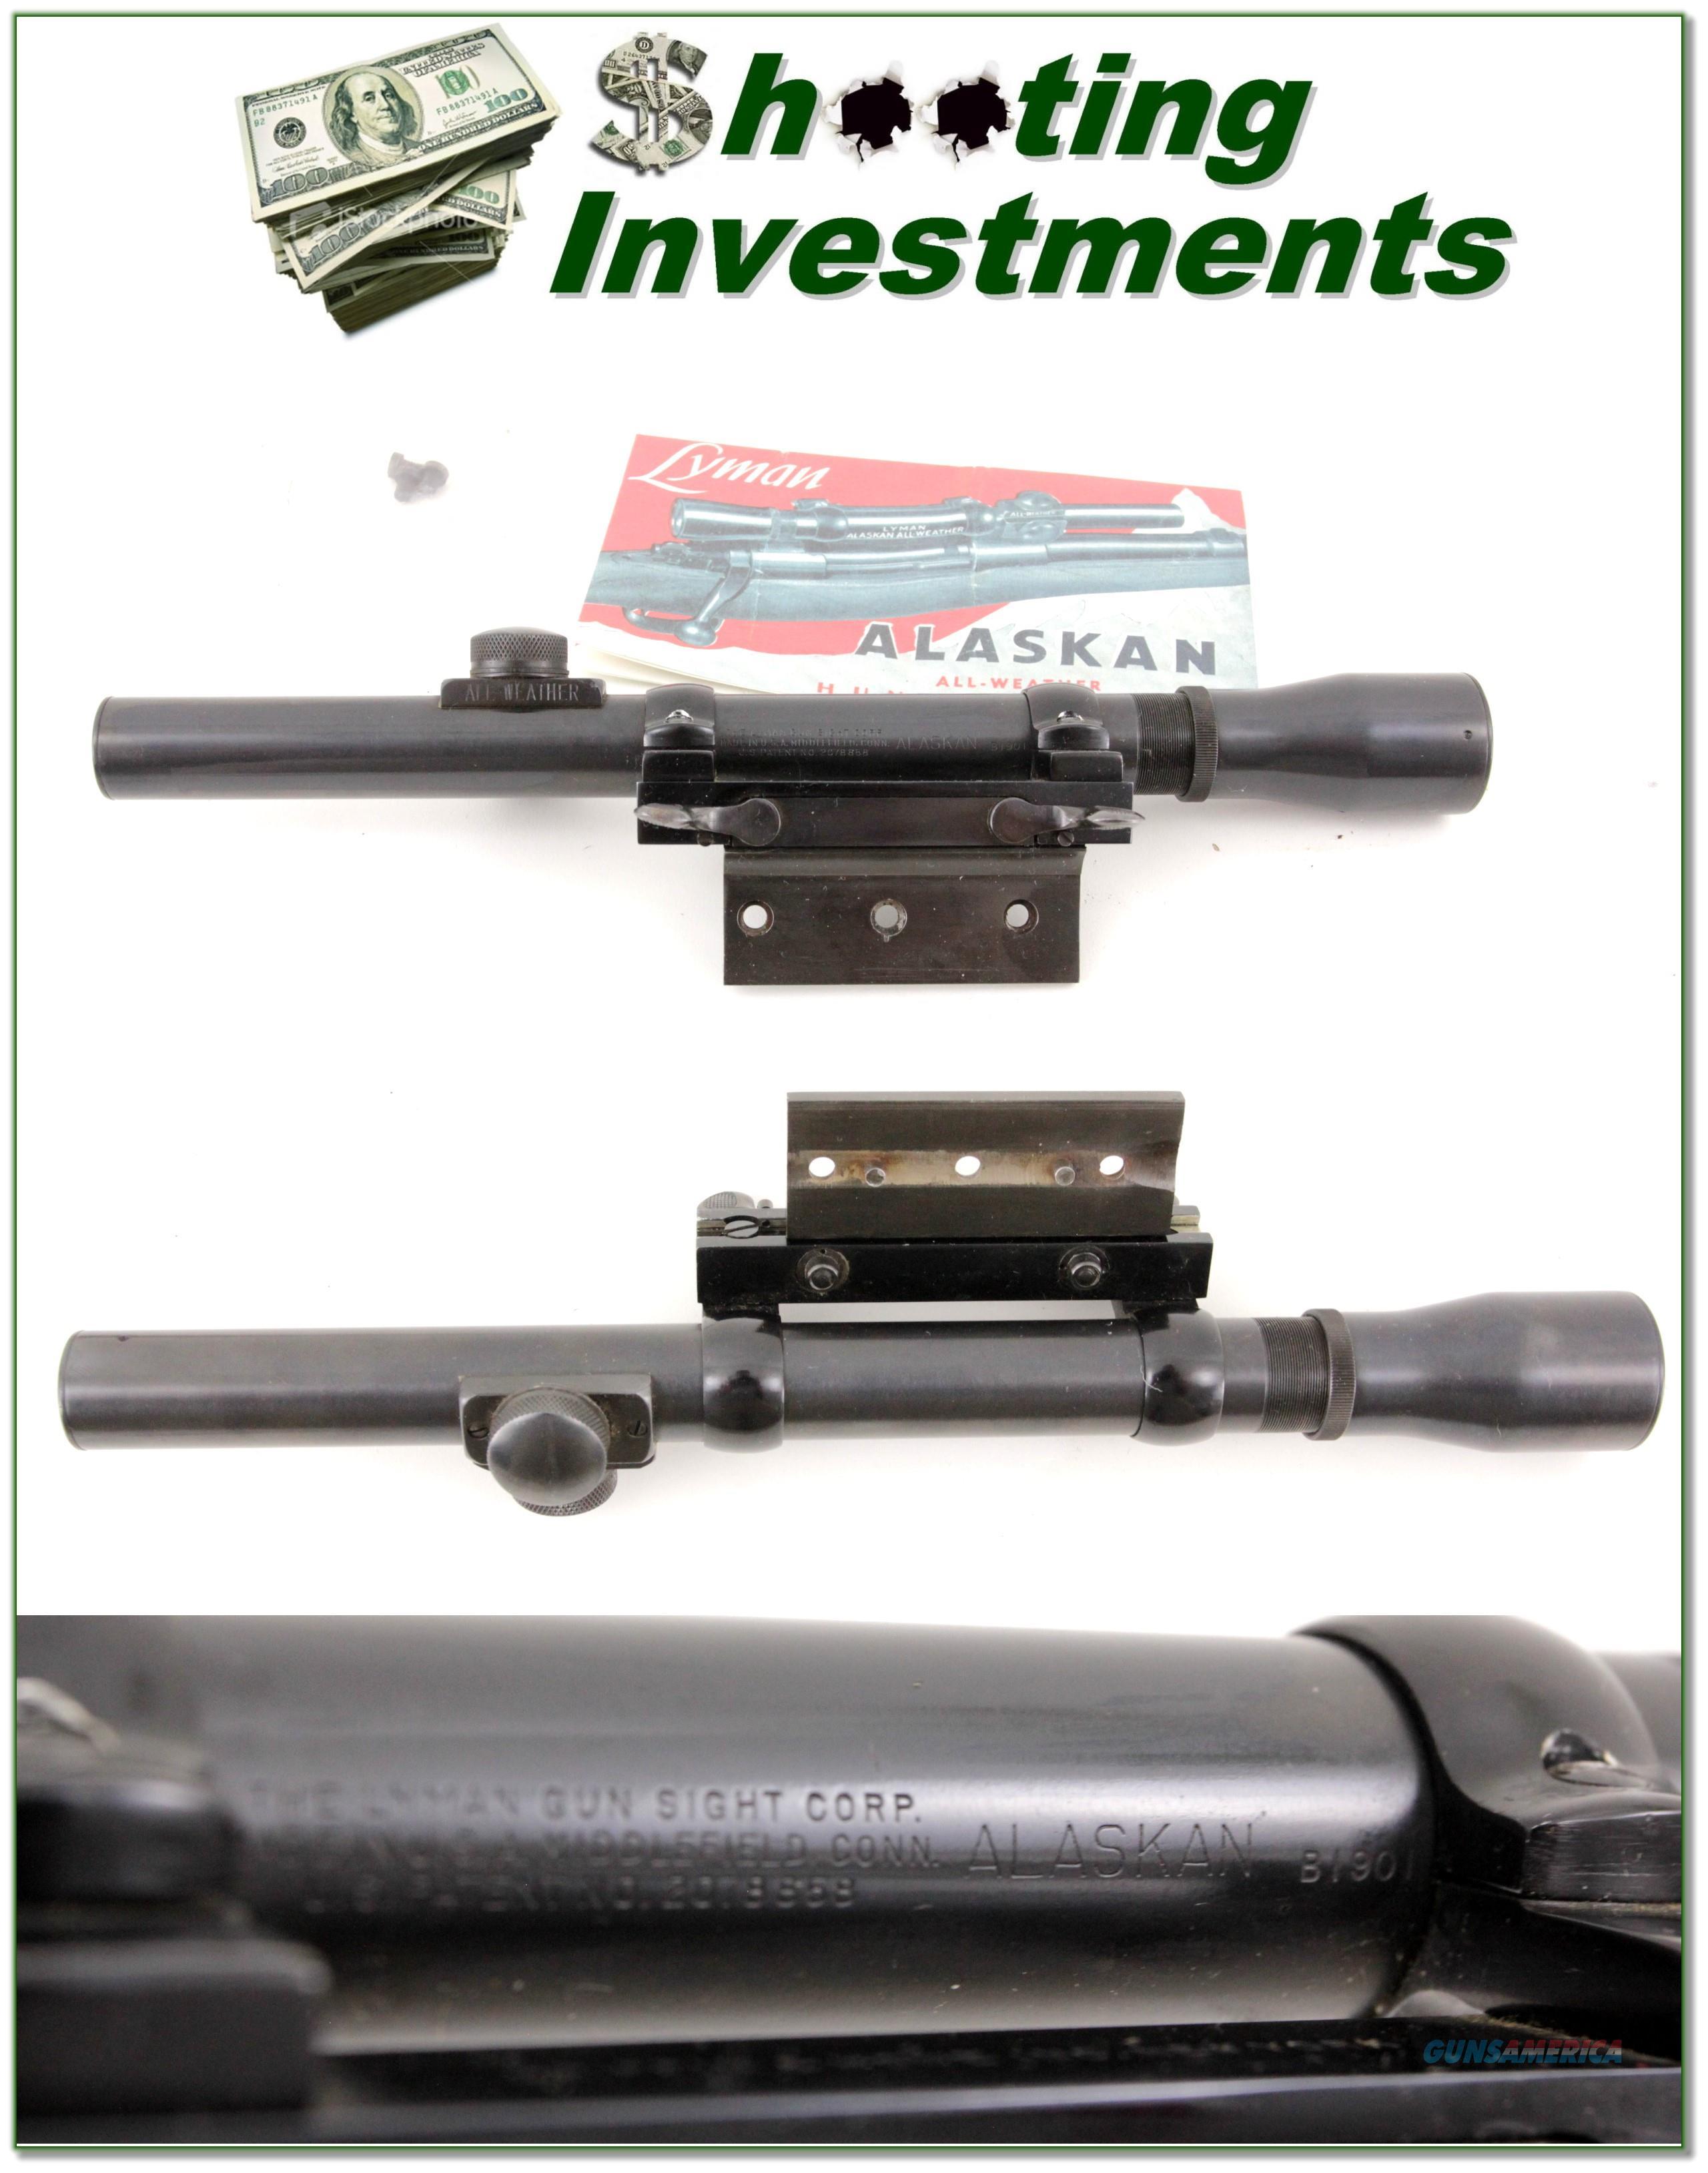 Lyman Alaskan 2 1/2X scope in Griffin & Howe mounts  Non-Guns > Scopes/Mounts/Rings & Optics > Rifle Scopes > Variable Focal Length